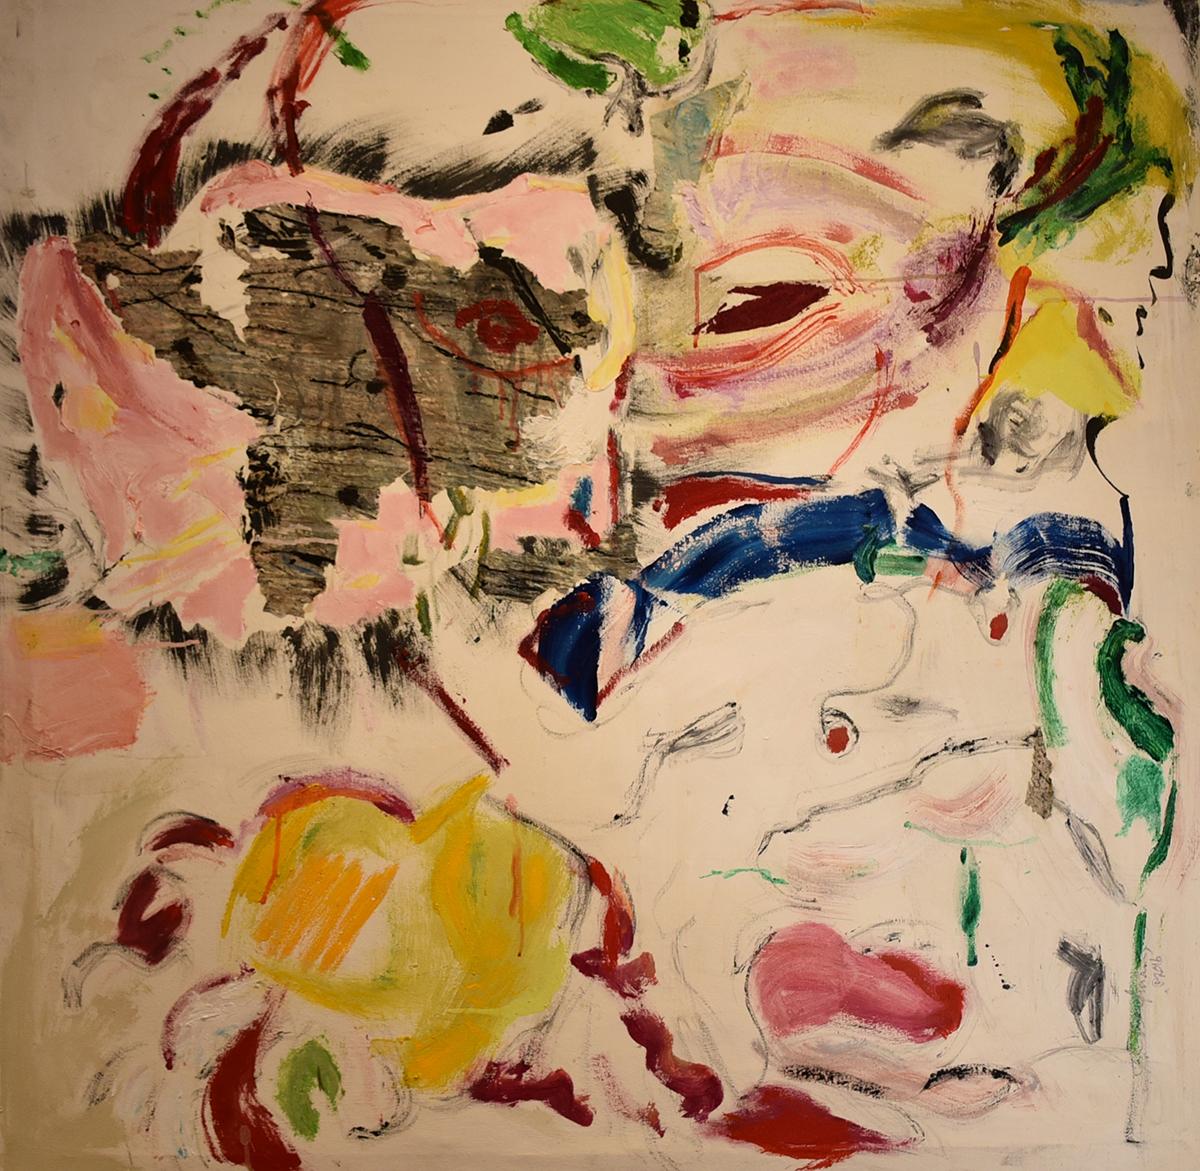 John Beardman, Anger, 2017, Mixed Media on Canvas, 45 x 45 inches, low res.jpg